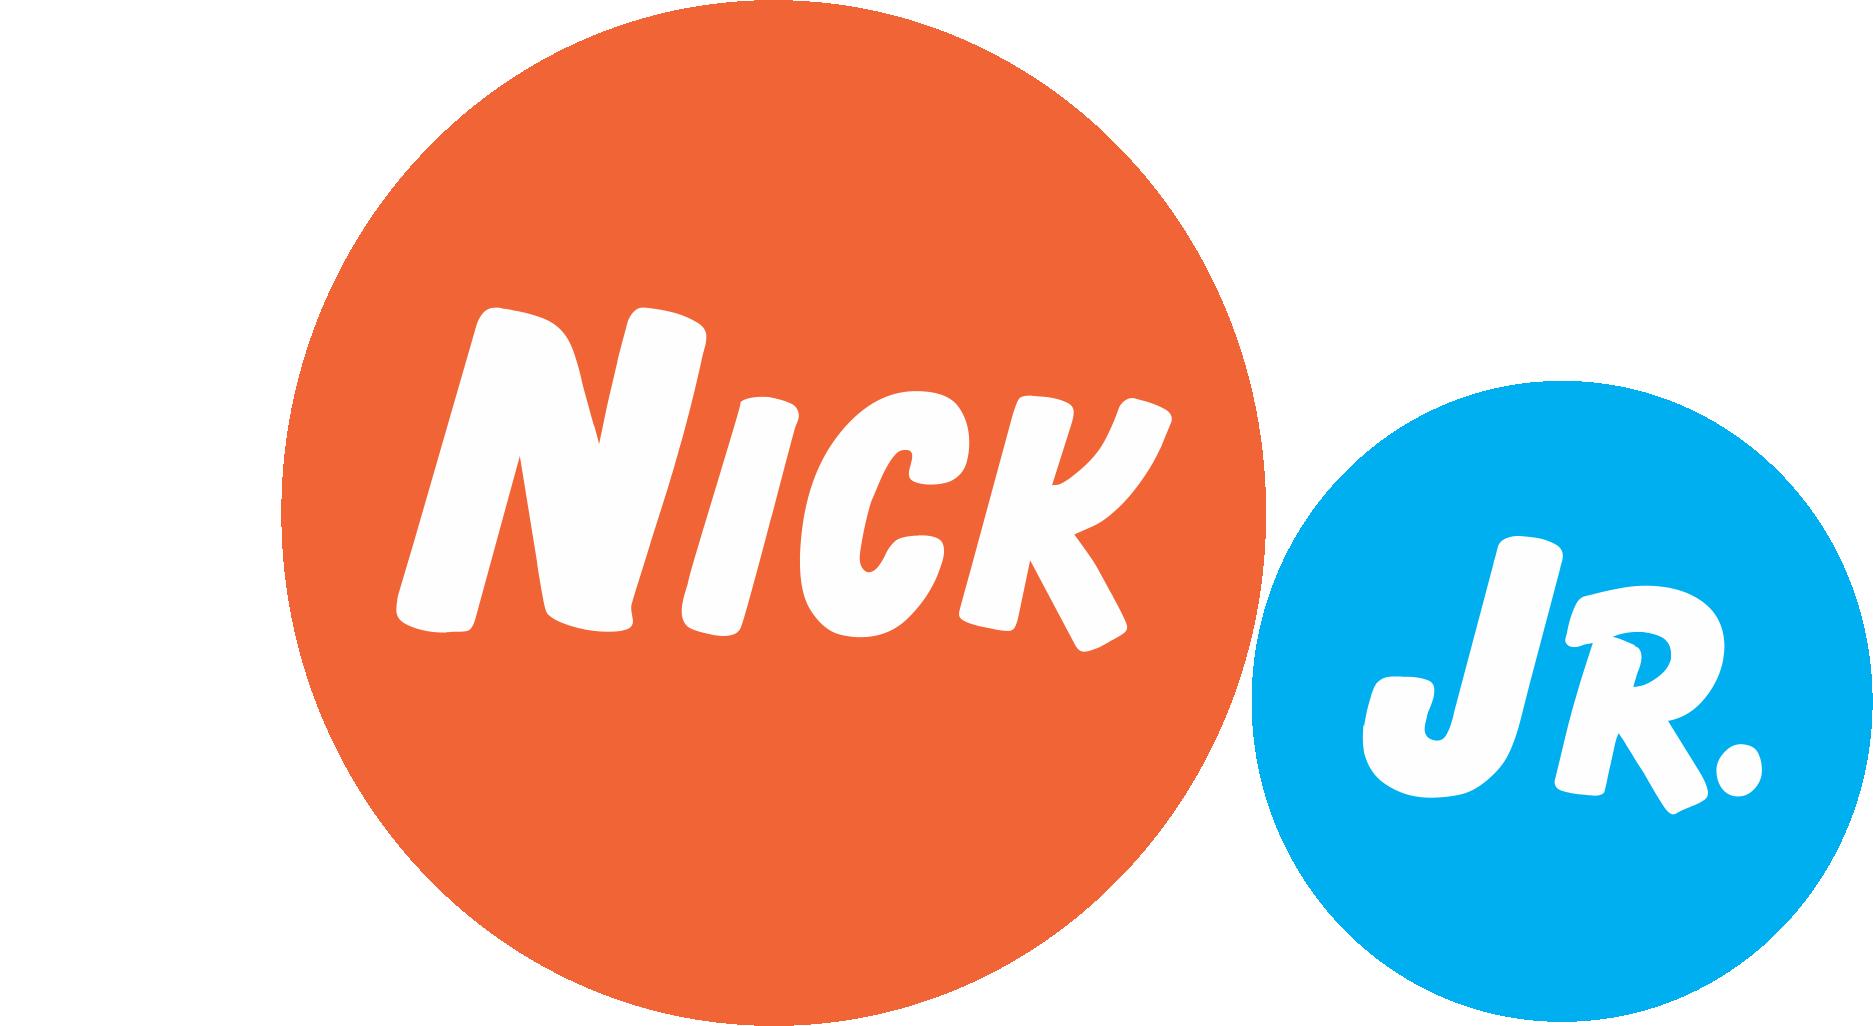 File:Nick.